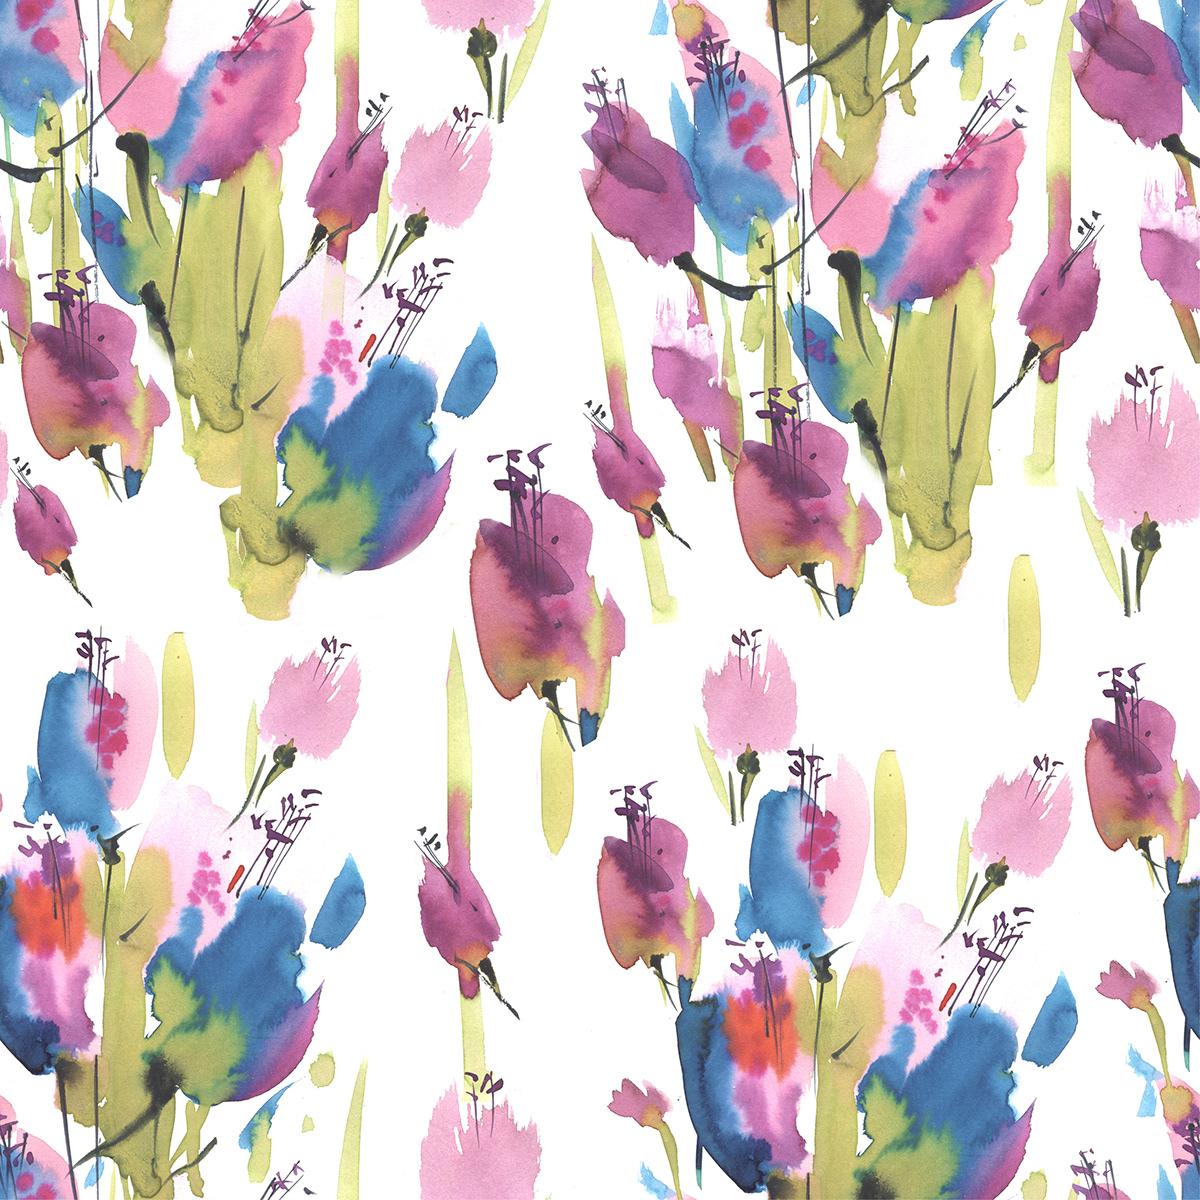 artist deisgn pattern Flowers prints russian artist watercolor паттерн принт художник цветы